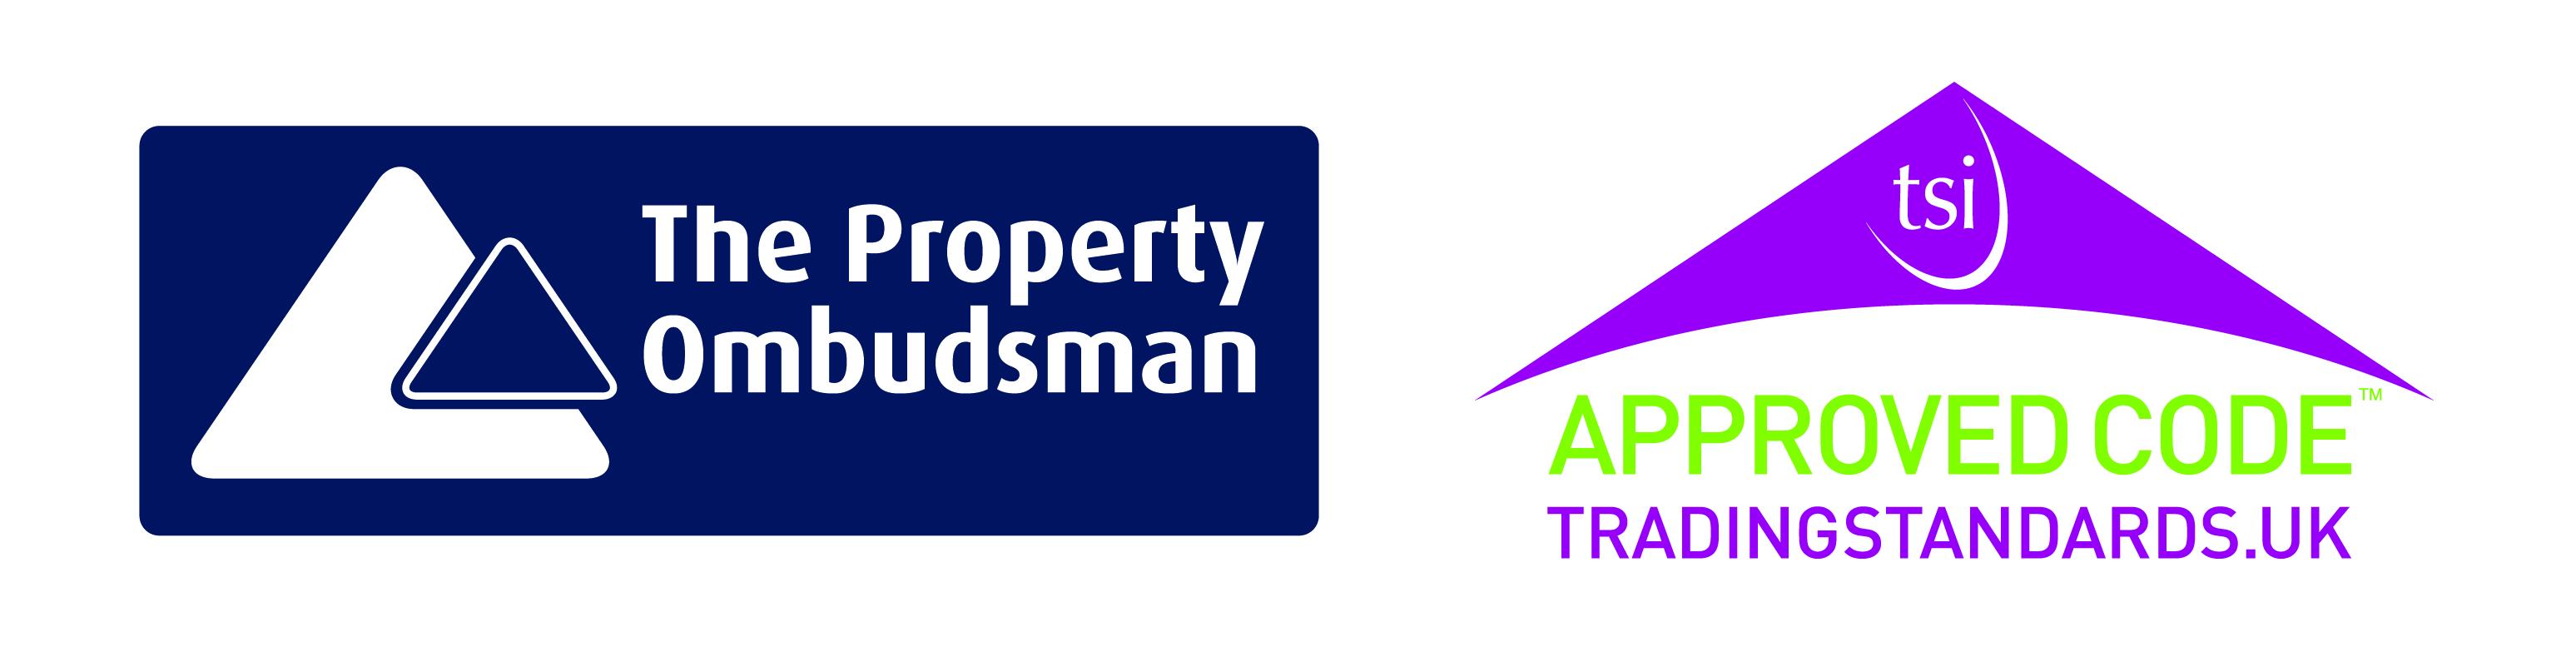 Ombudsman and Tradingstandards logo